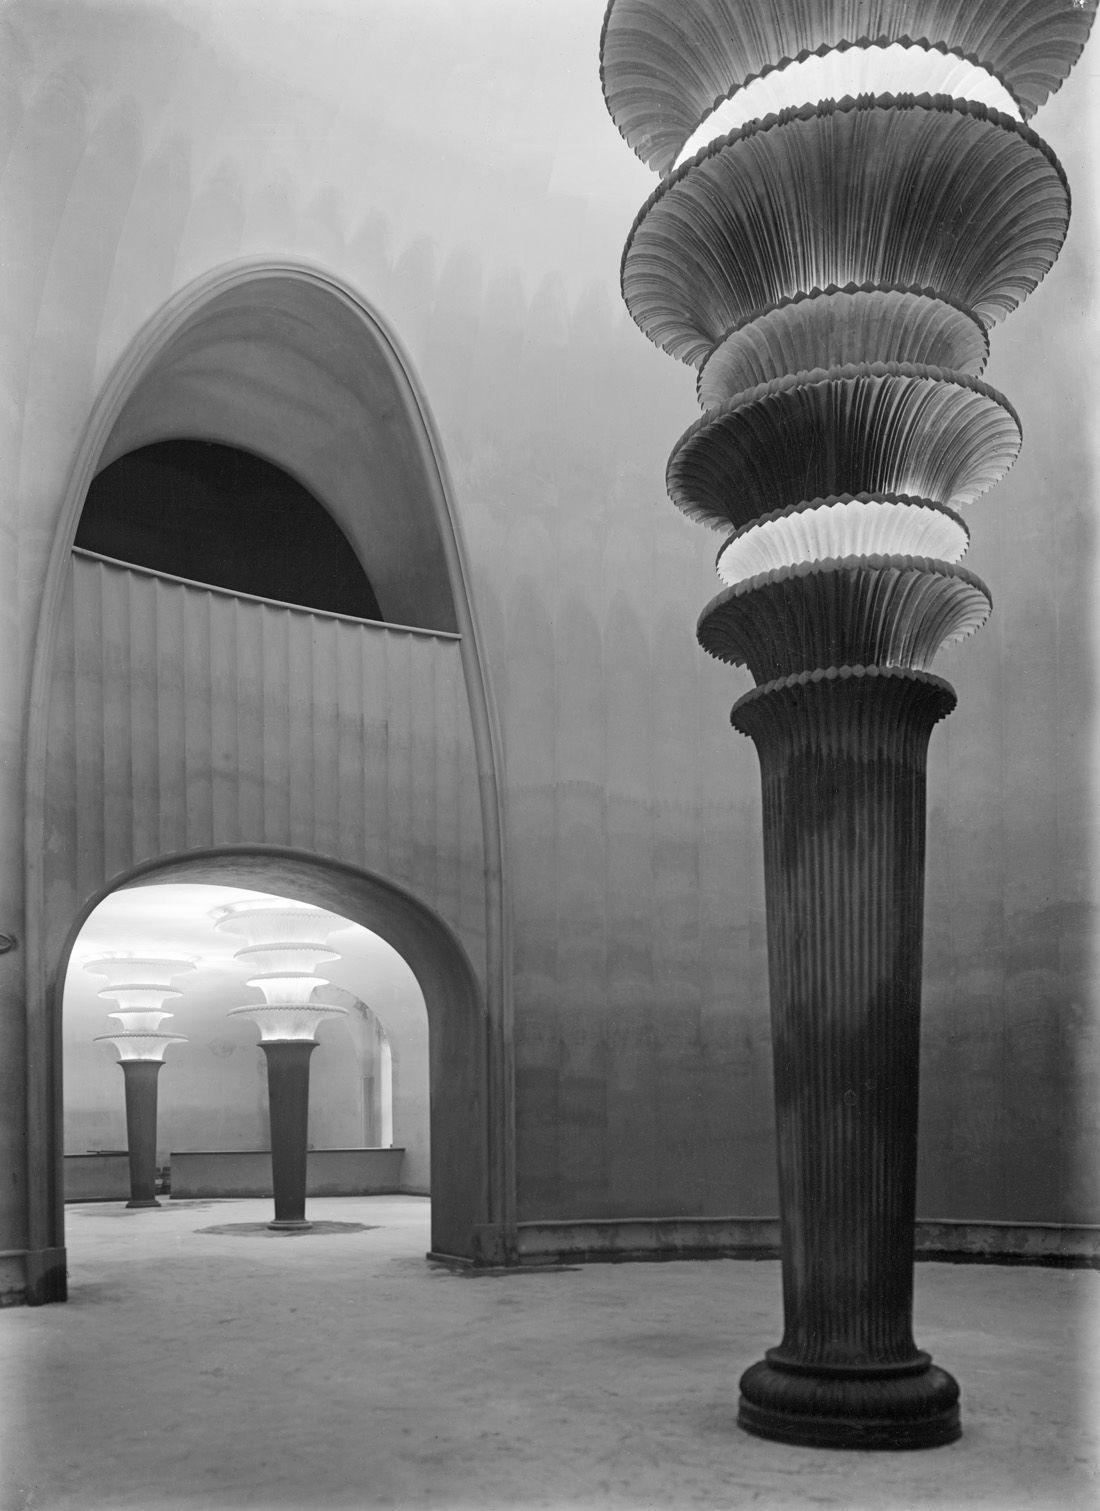 grosses schauspielhaus berlin poelzig foyer circa 1920 cities berlin pinterest. Black Bedroom Furniture Sets. Home Design Ideas